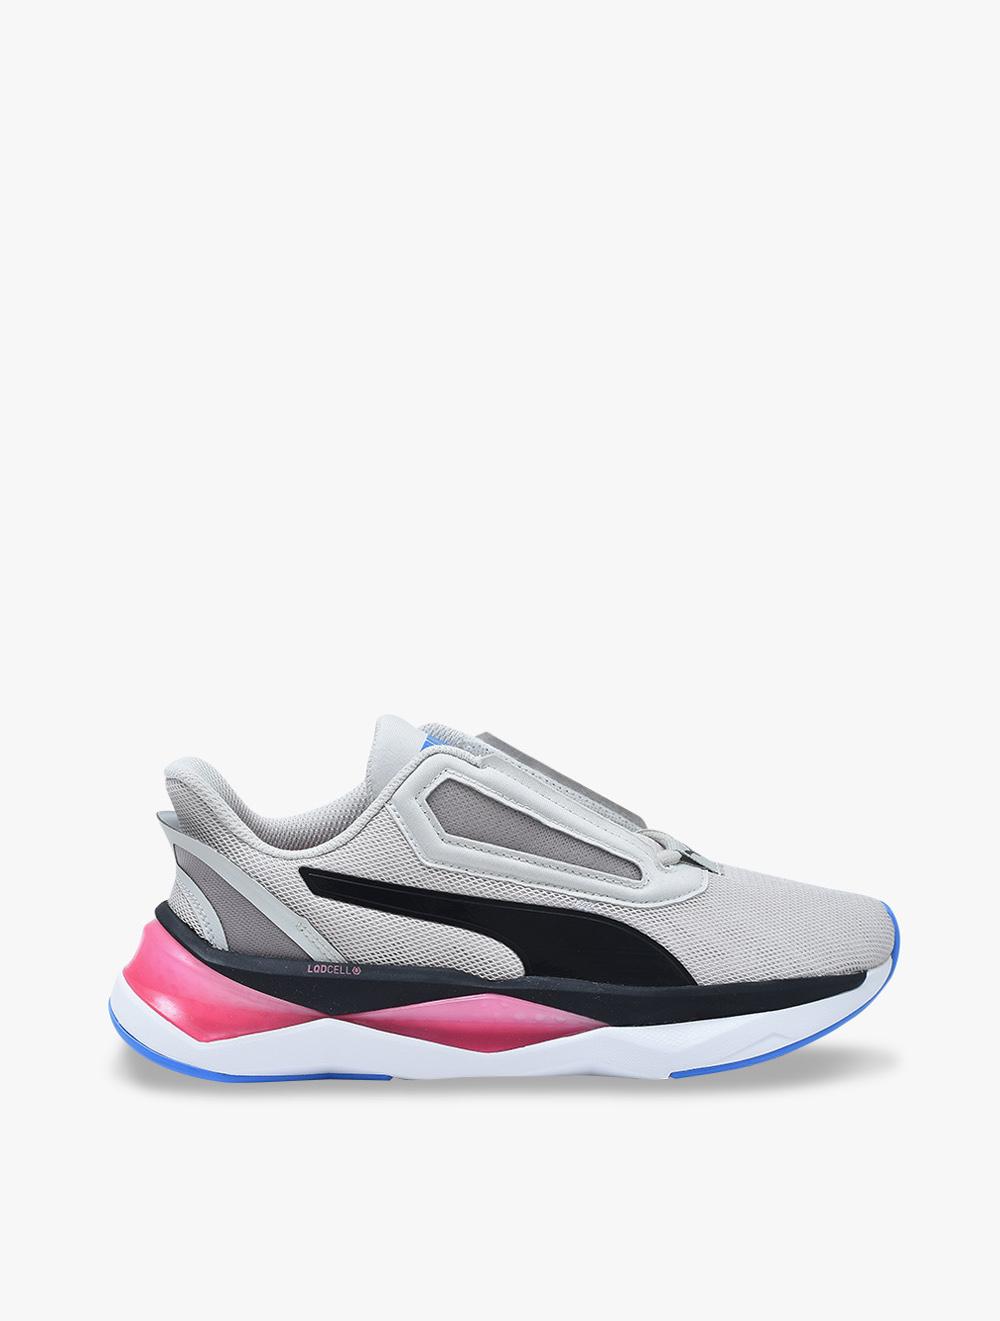 Puma LQDCELL Shatter XT Shift Q4 Women's Training Shoes - Grey